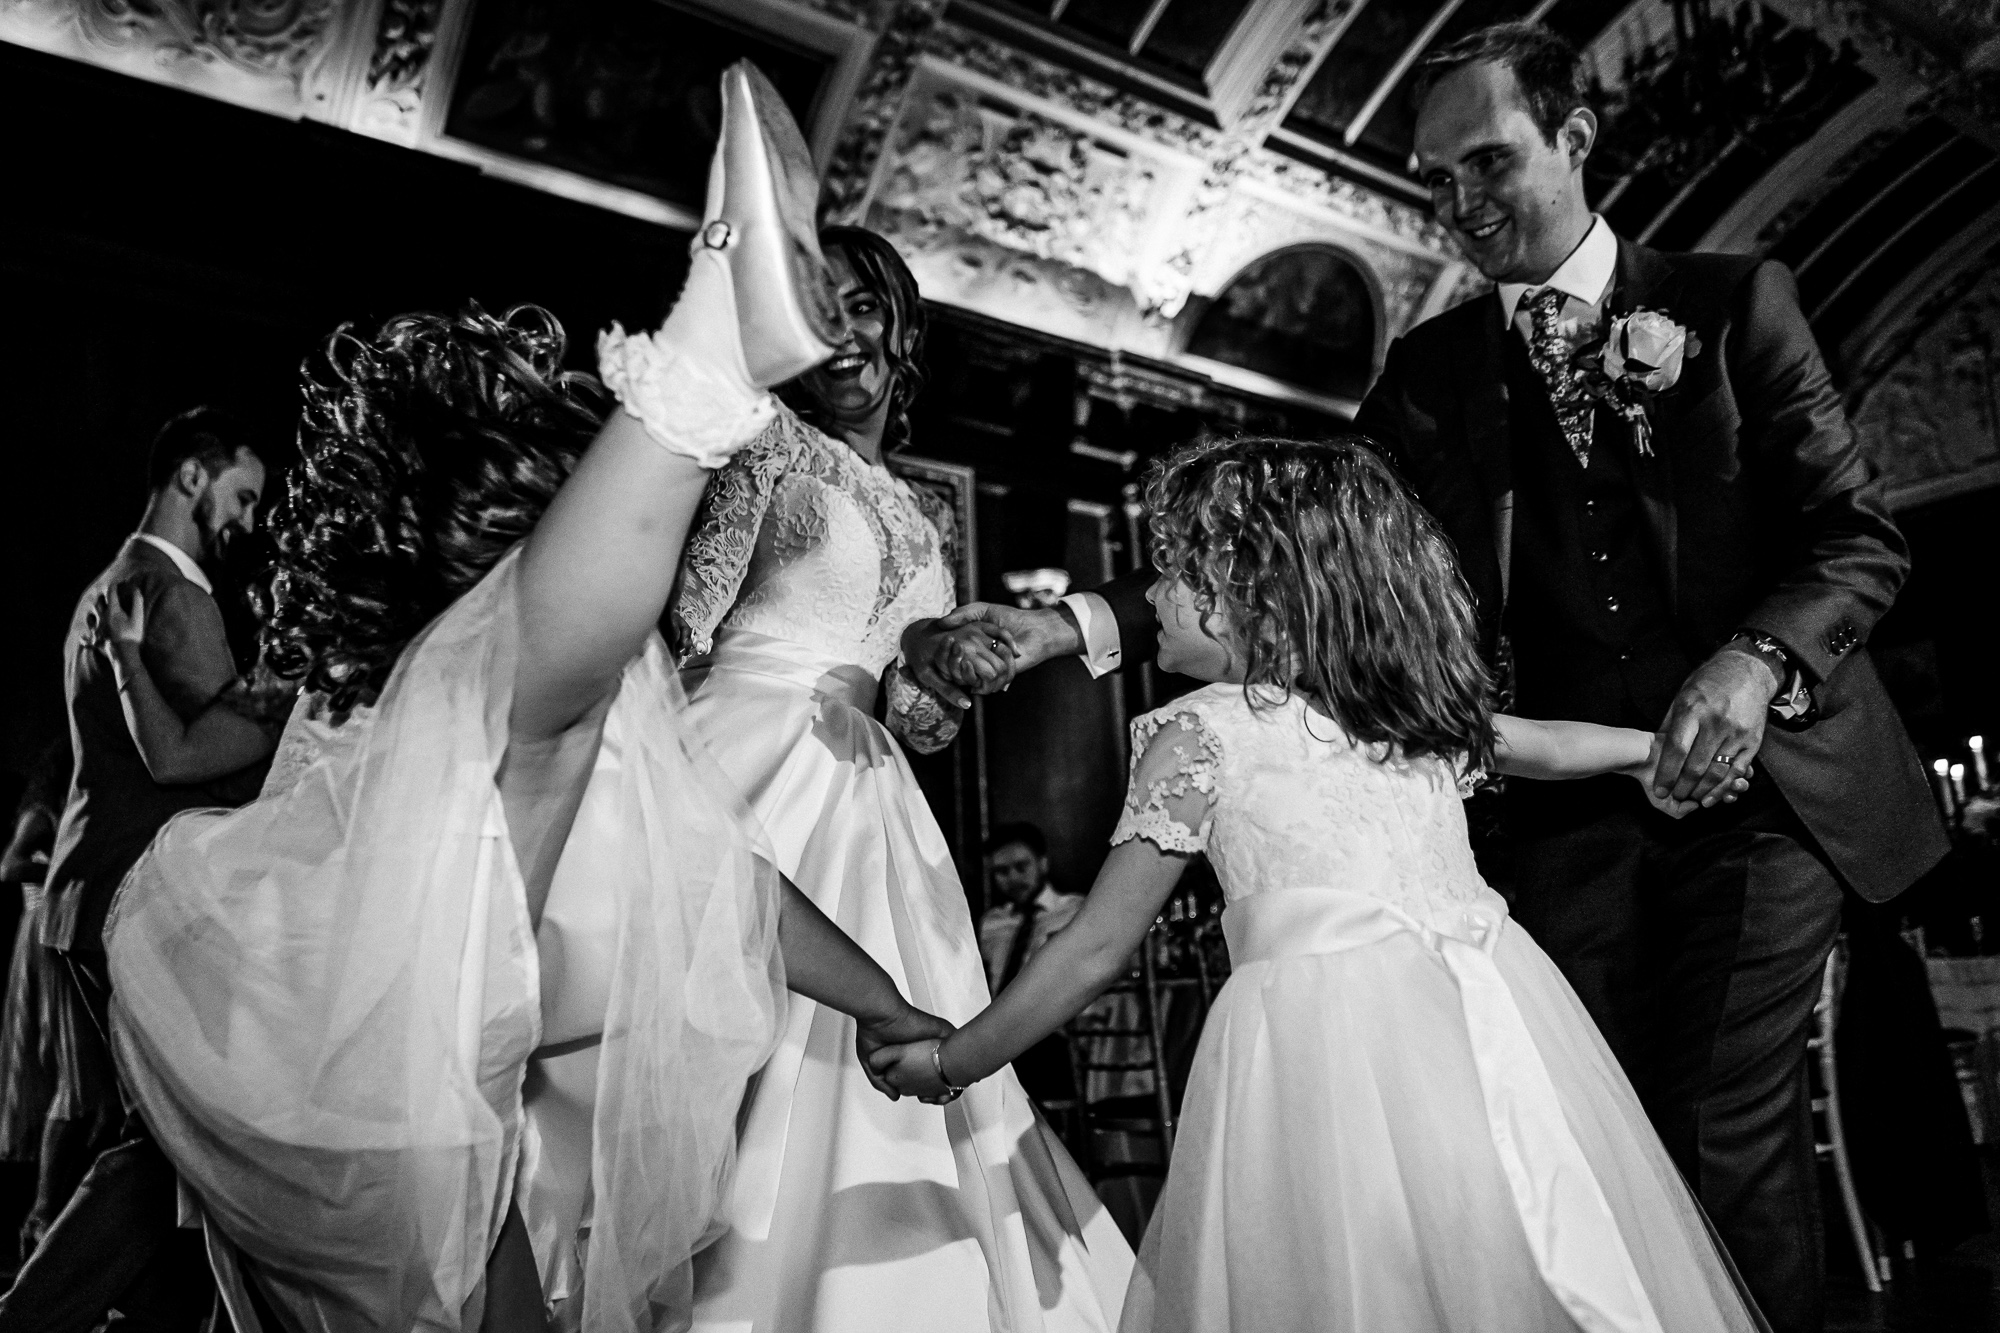 Thornton Manor Cheshire wedding photographer Wedding Photography Cheshire wedding photographer (64 of 64).jpg